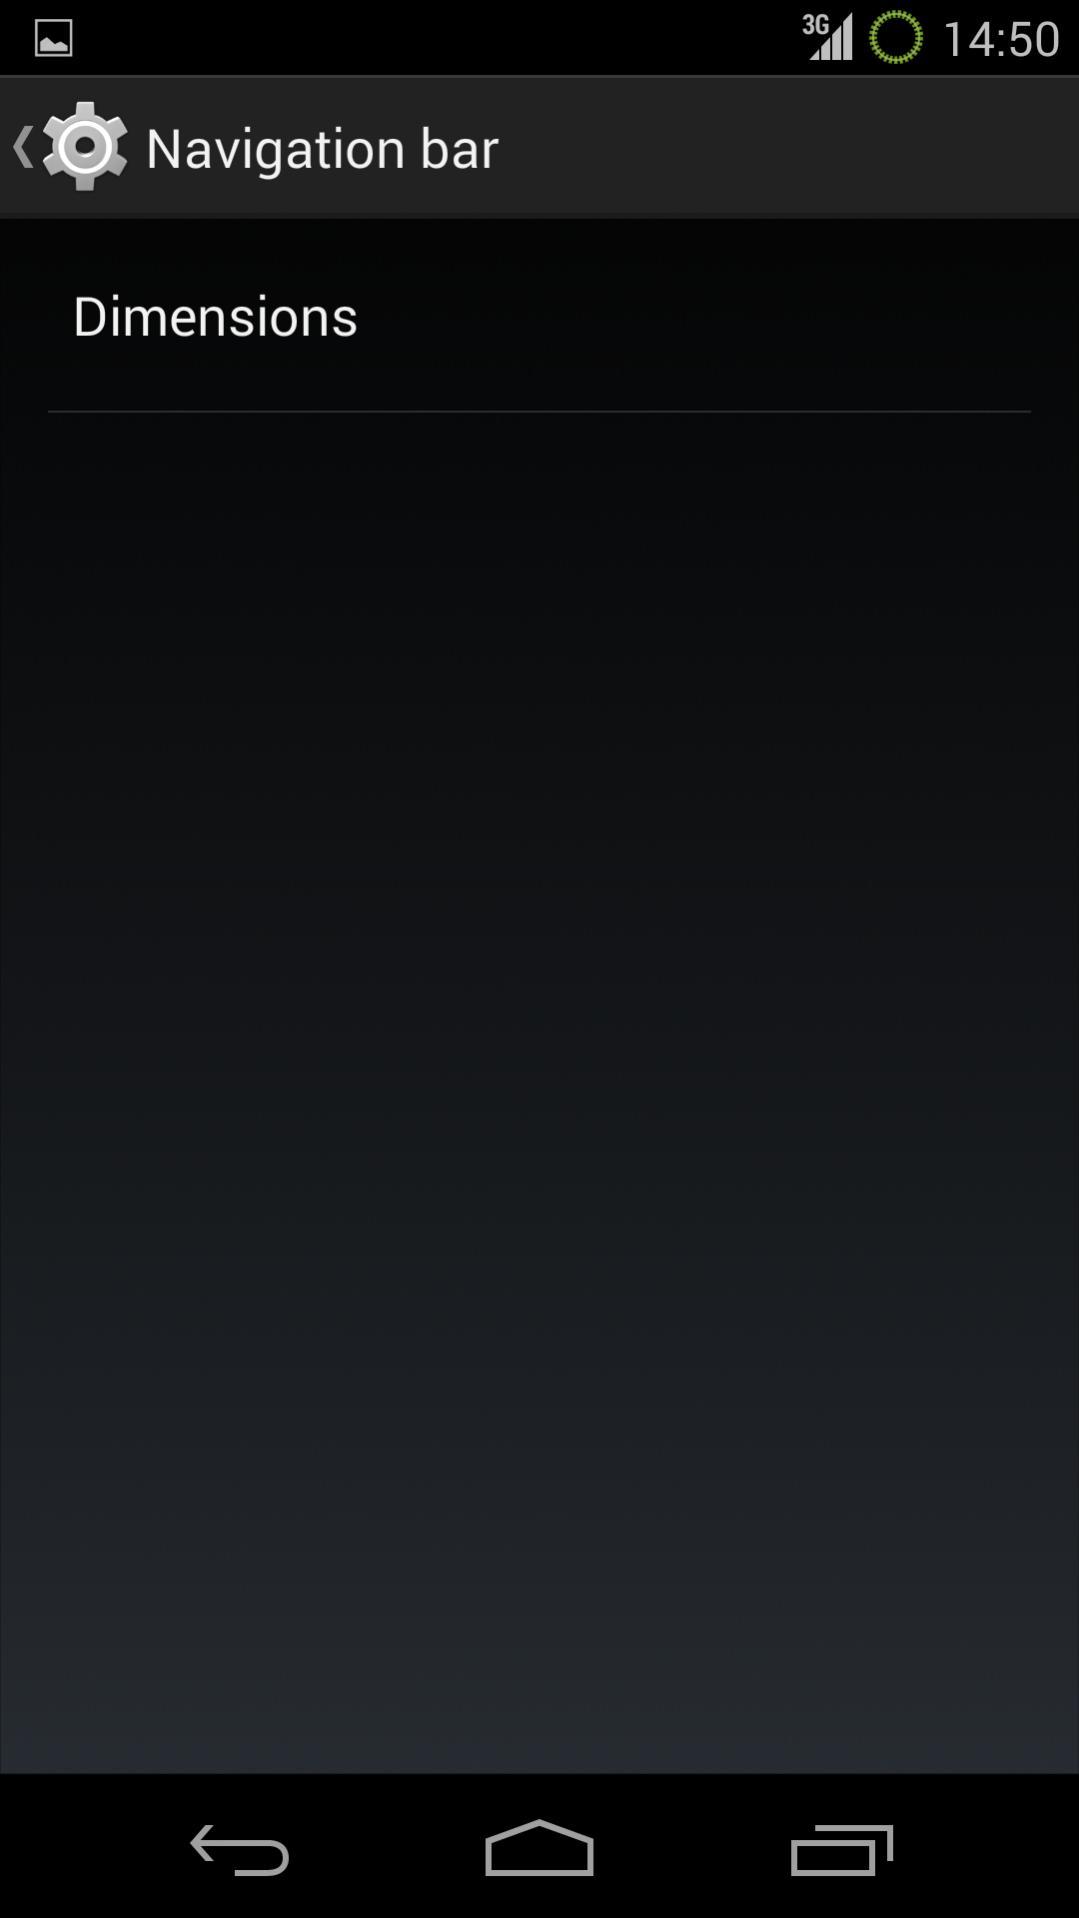 [ROM 4.4.2][KVT49L]  ♦ PURITY ROM ♦ [Hammerhead][06.03.2014] Attachment